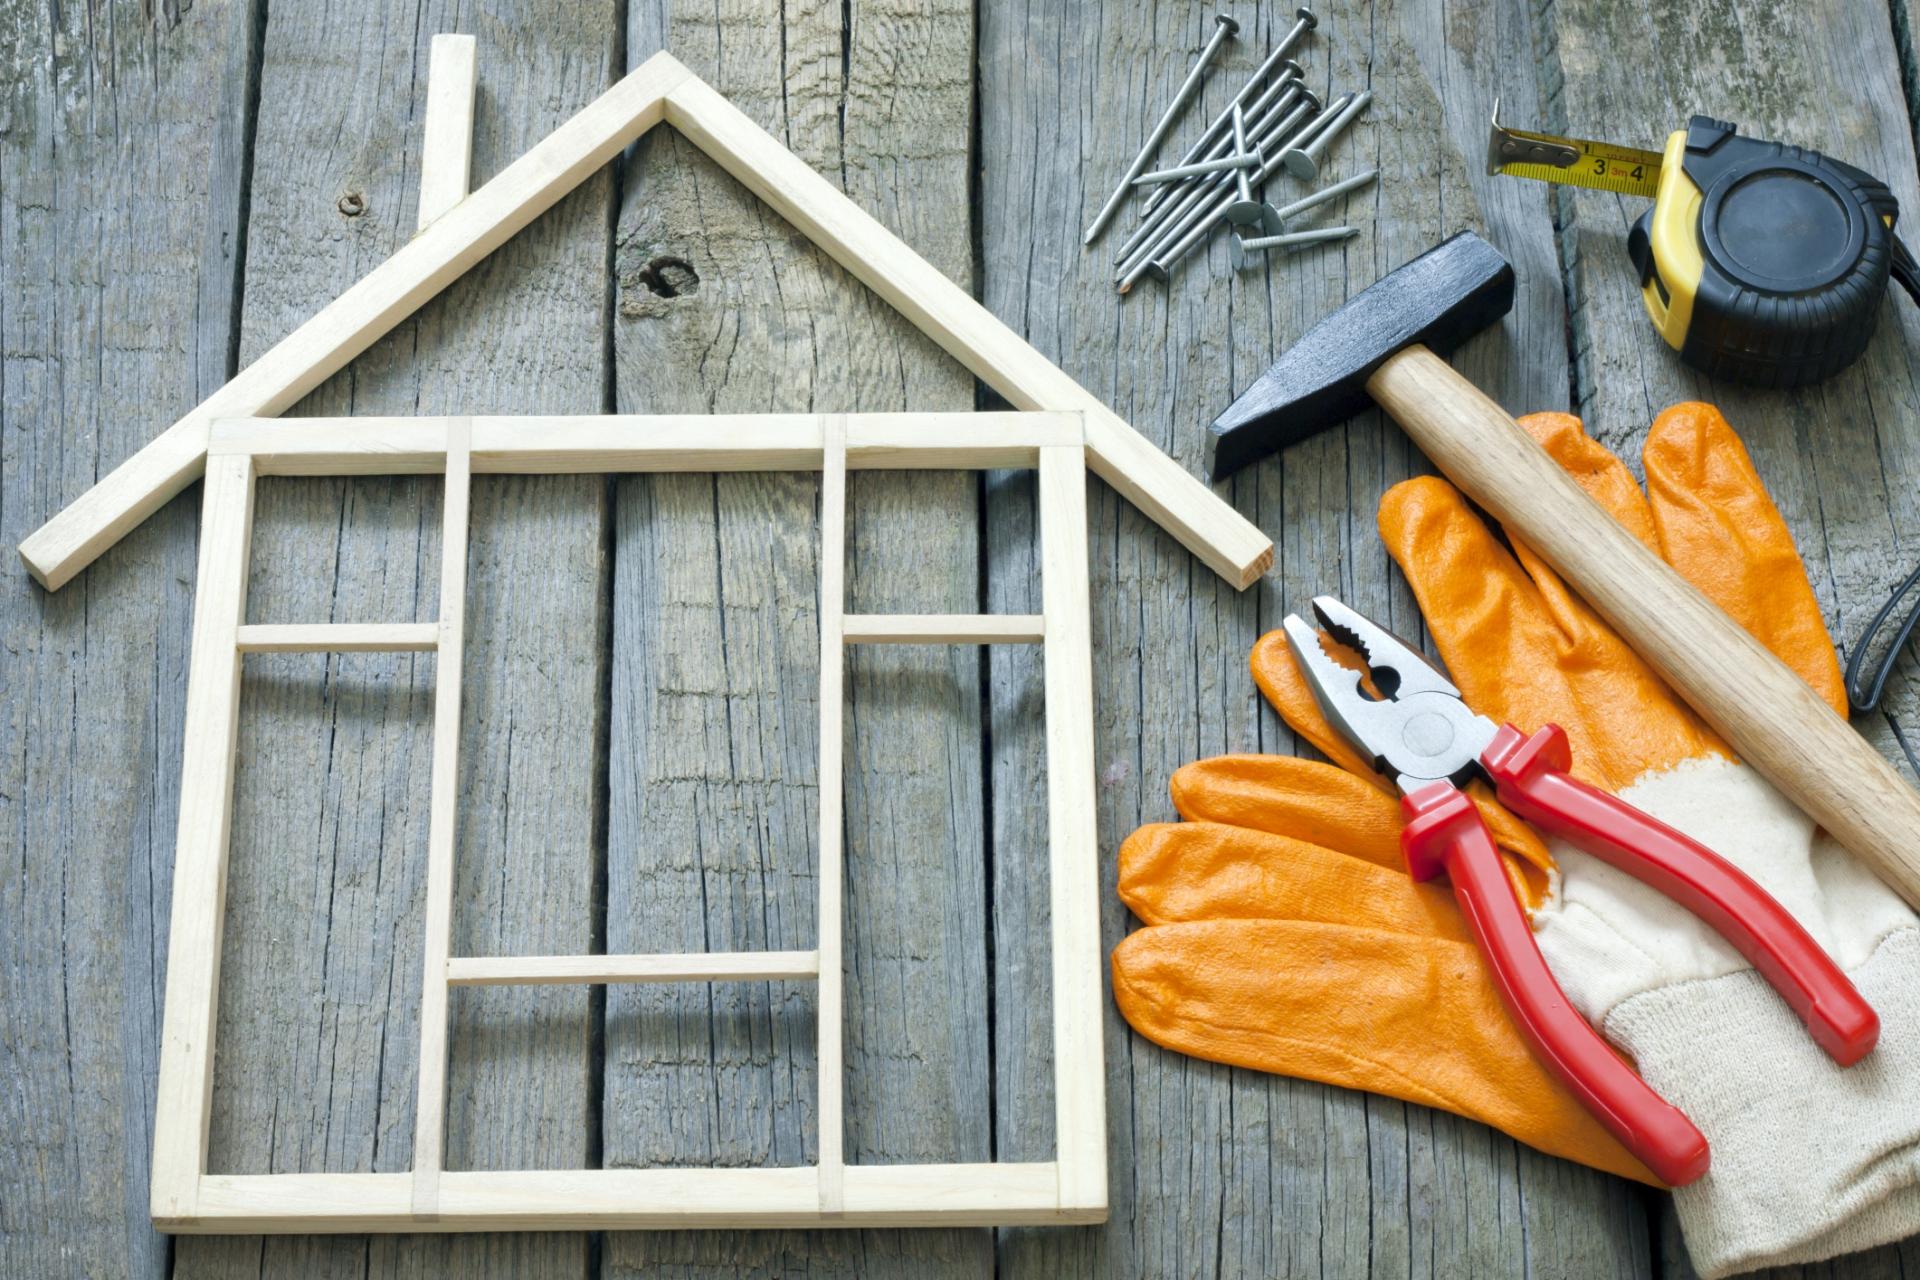 about home renovation 2 همه چیز درباره بازسازی منزل